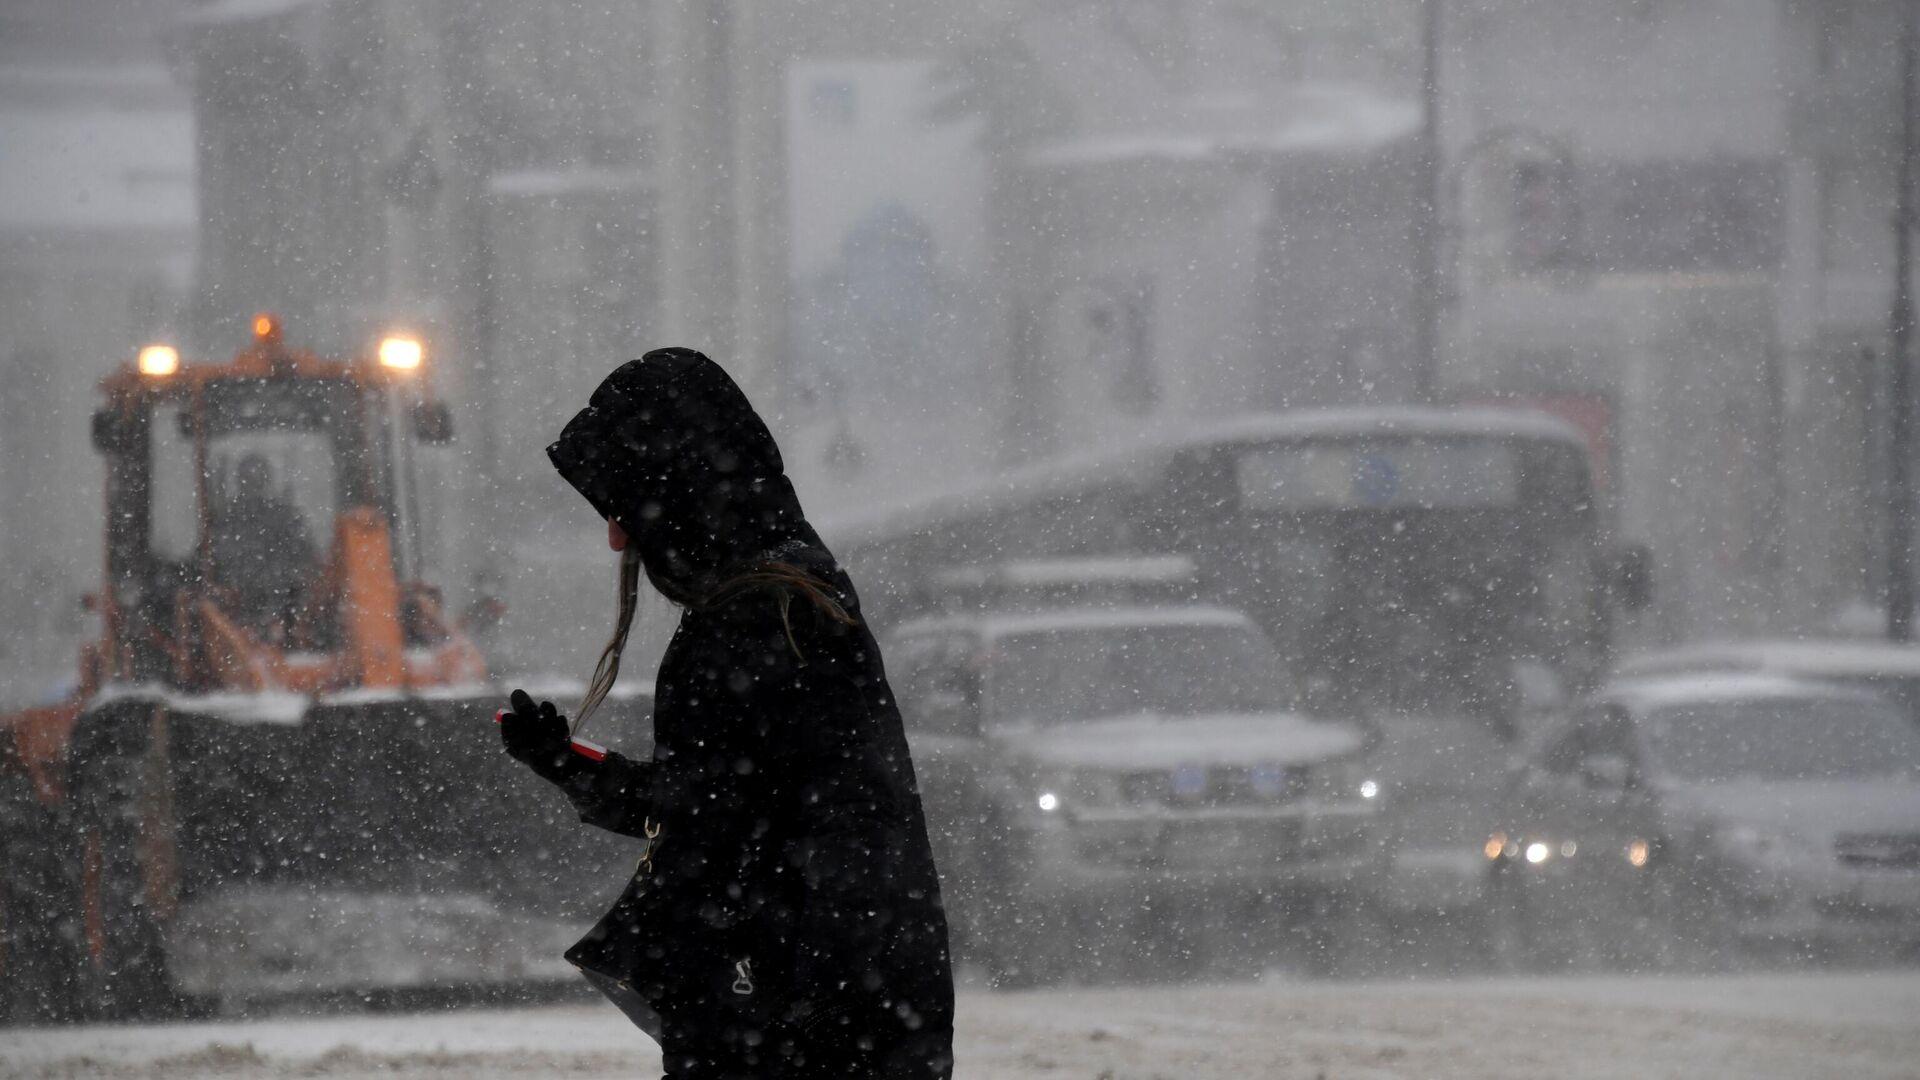 Снегопад - РИА Новости, 1920, 08.02.2021